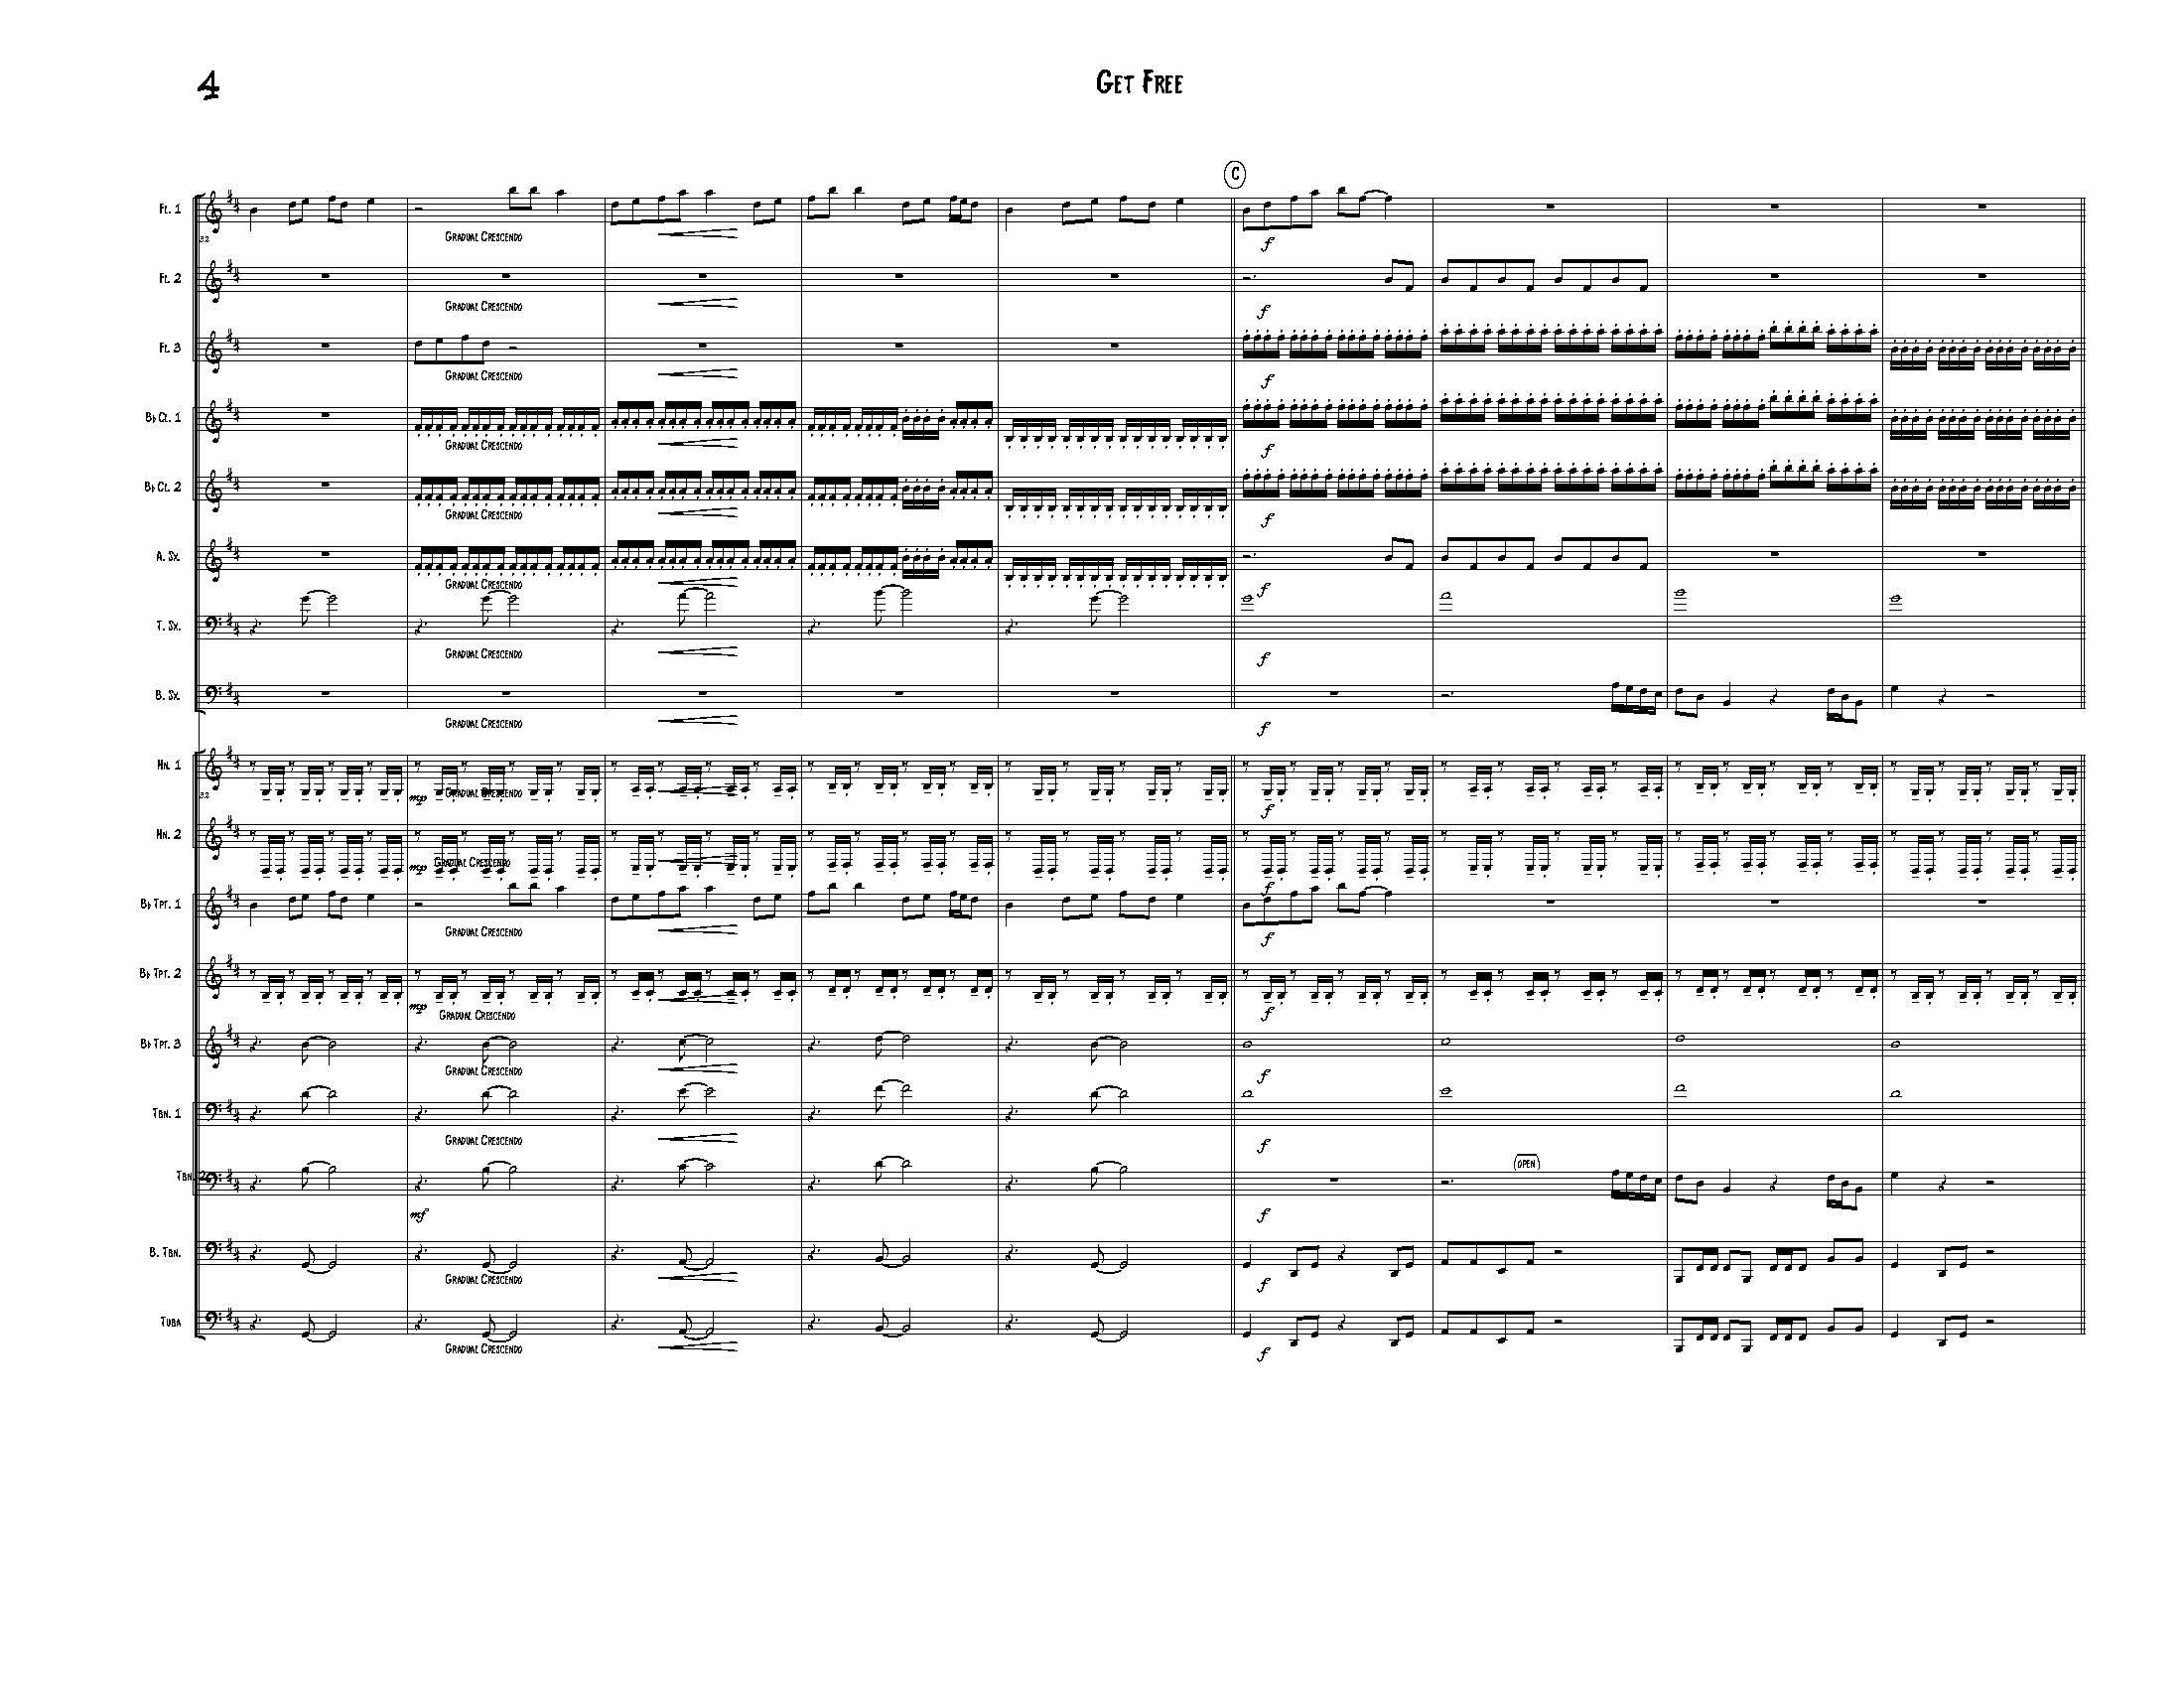 Get Free BKLYN 1834 Score_Page_04.jpg